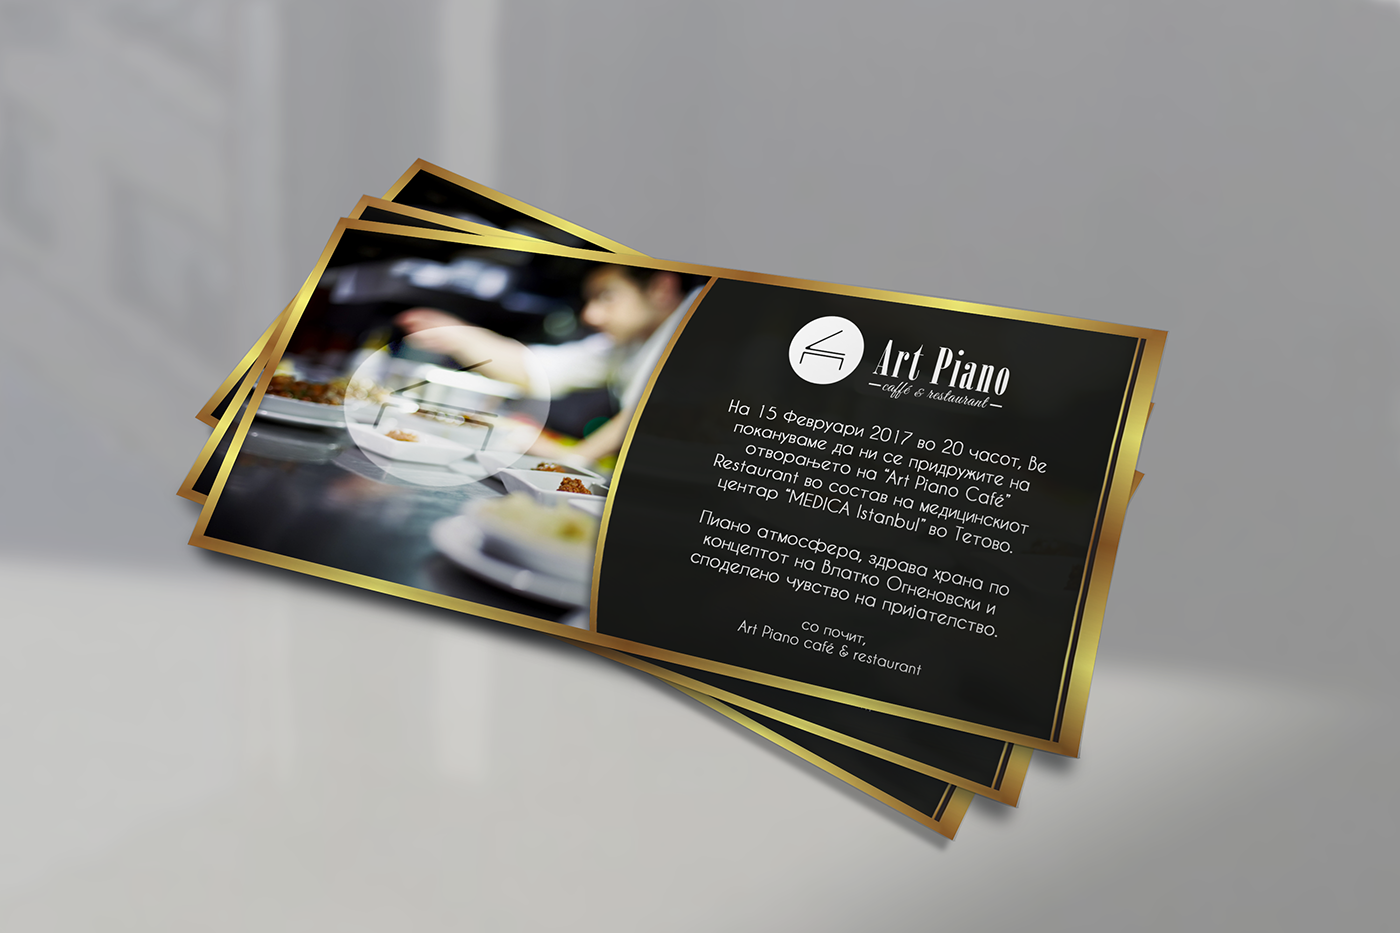 Restaurant opening invitation card on behance art piano caff restaurant opening invitation card macedonian language stopboris Images